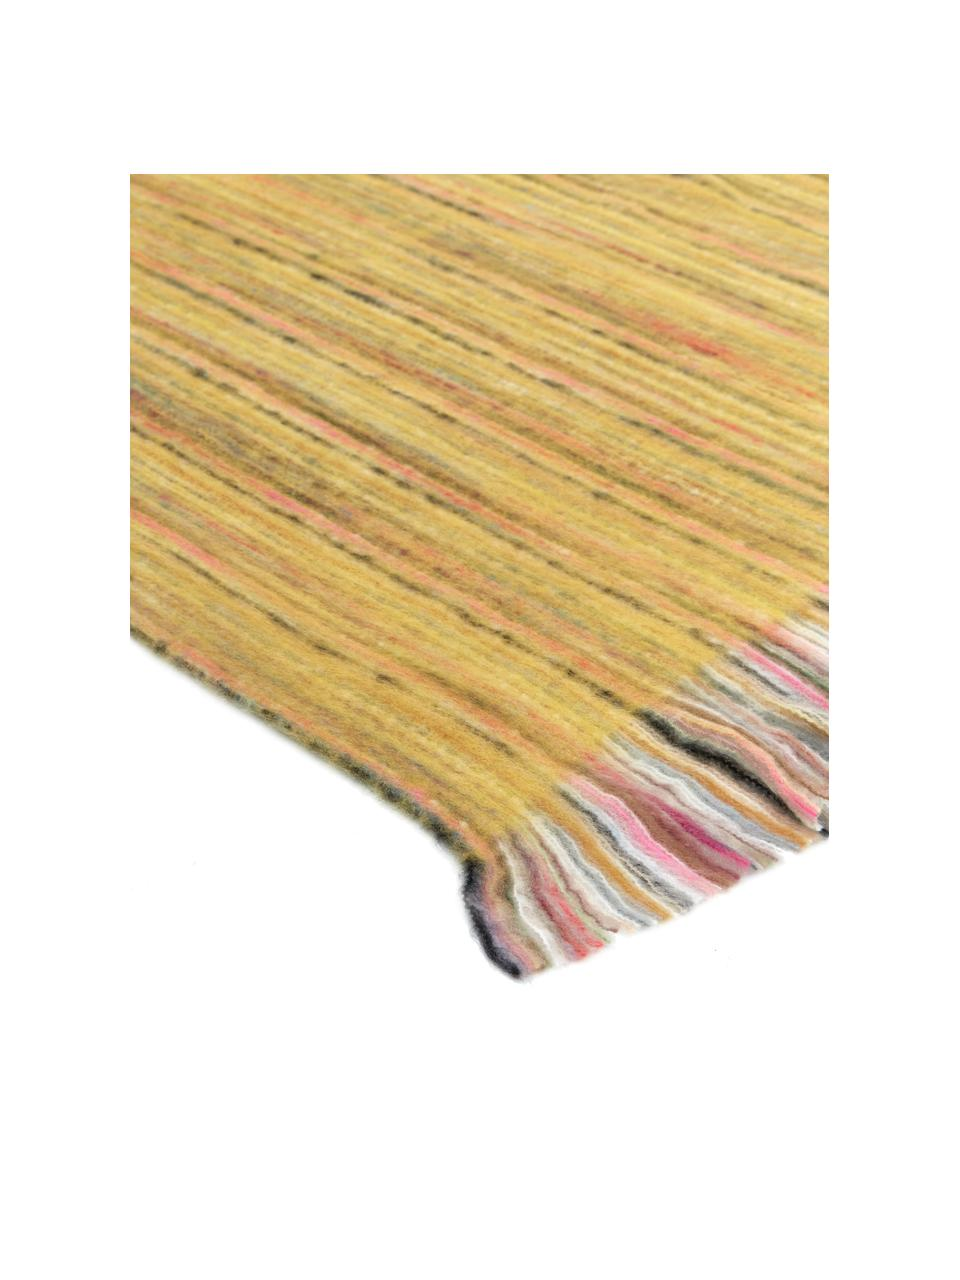 Bunt meliertes Plaid Ayana mit Fransen, 100% Acryl, Gelb, Mehrfarbig, 130 x 190 cm